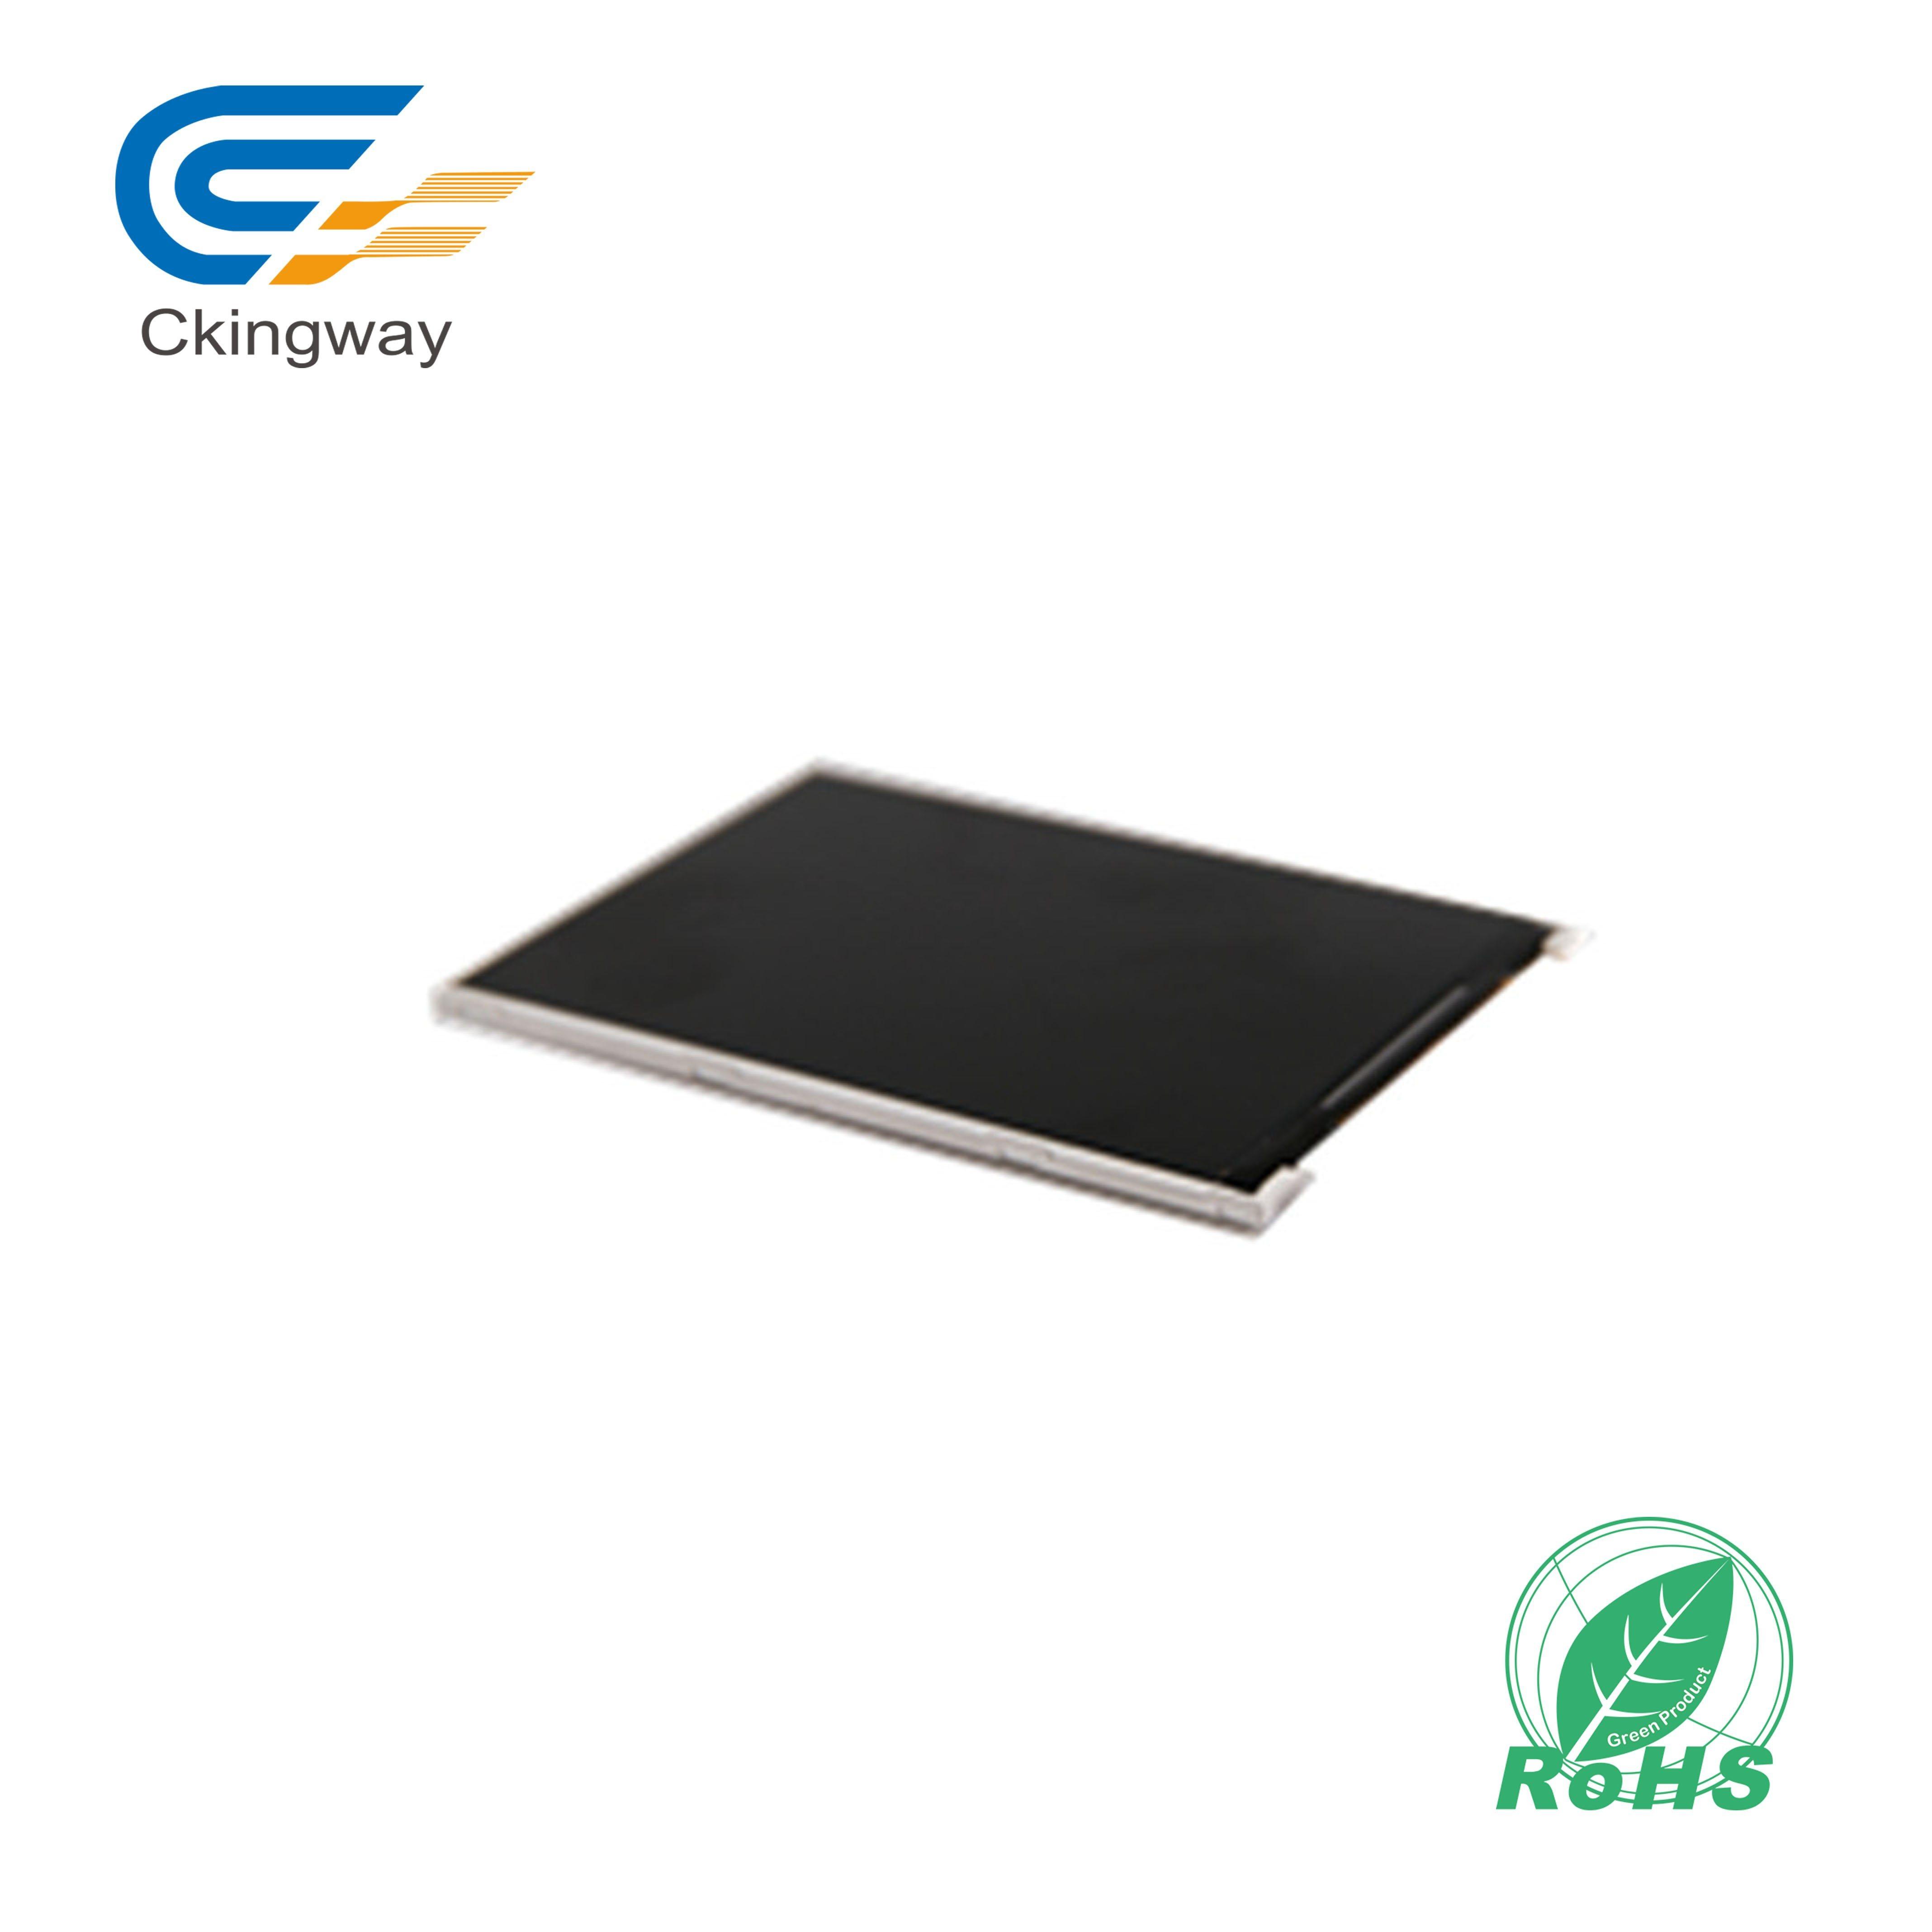 High Brightness Sunlight Readable LCD TFT Touch Screen